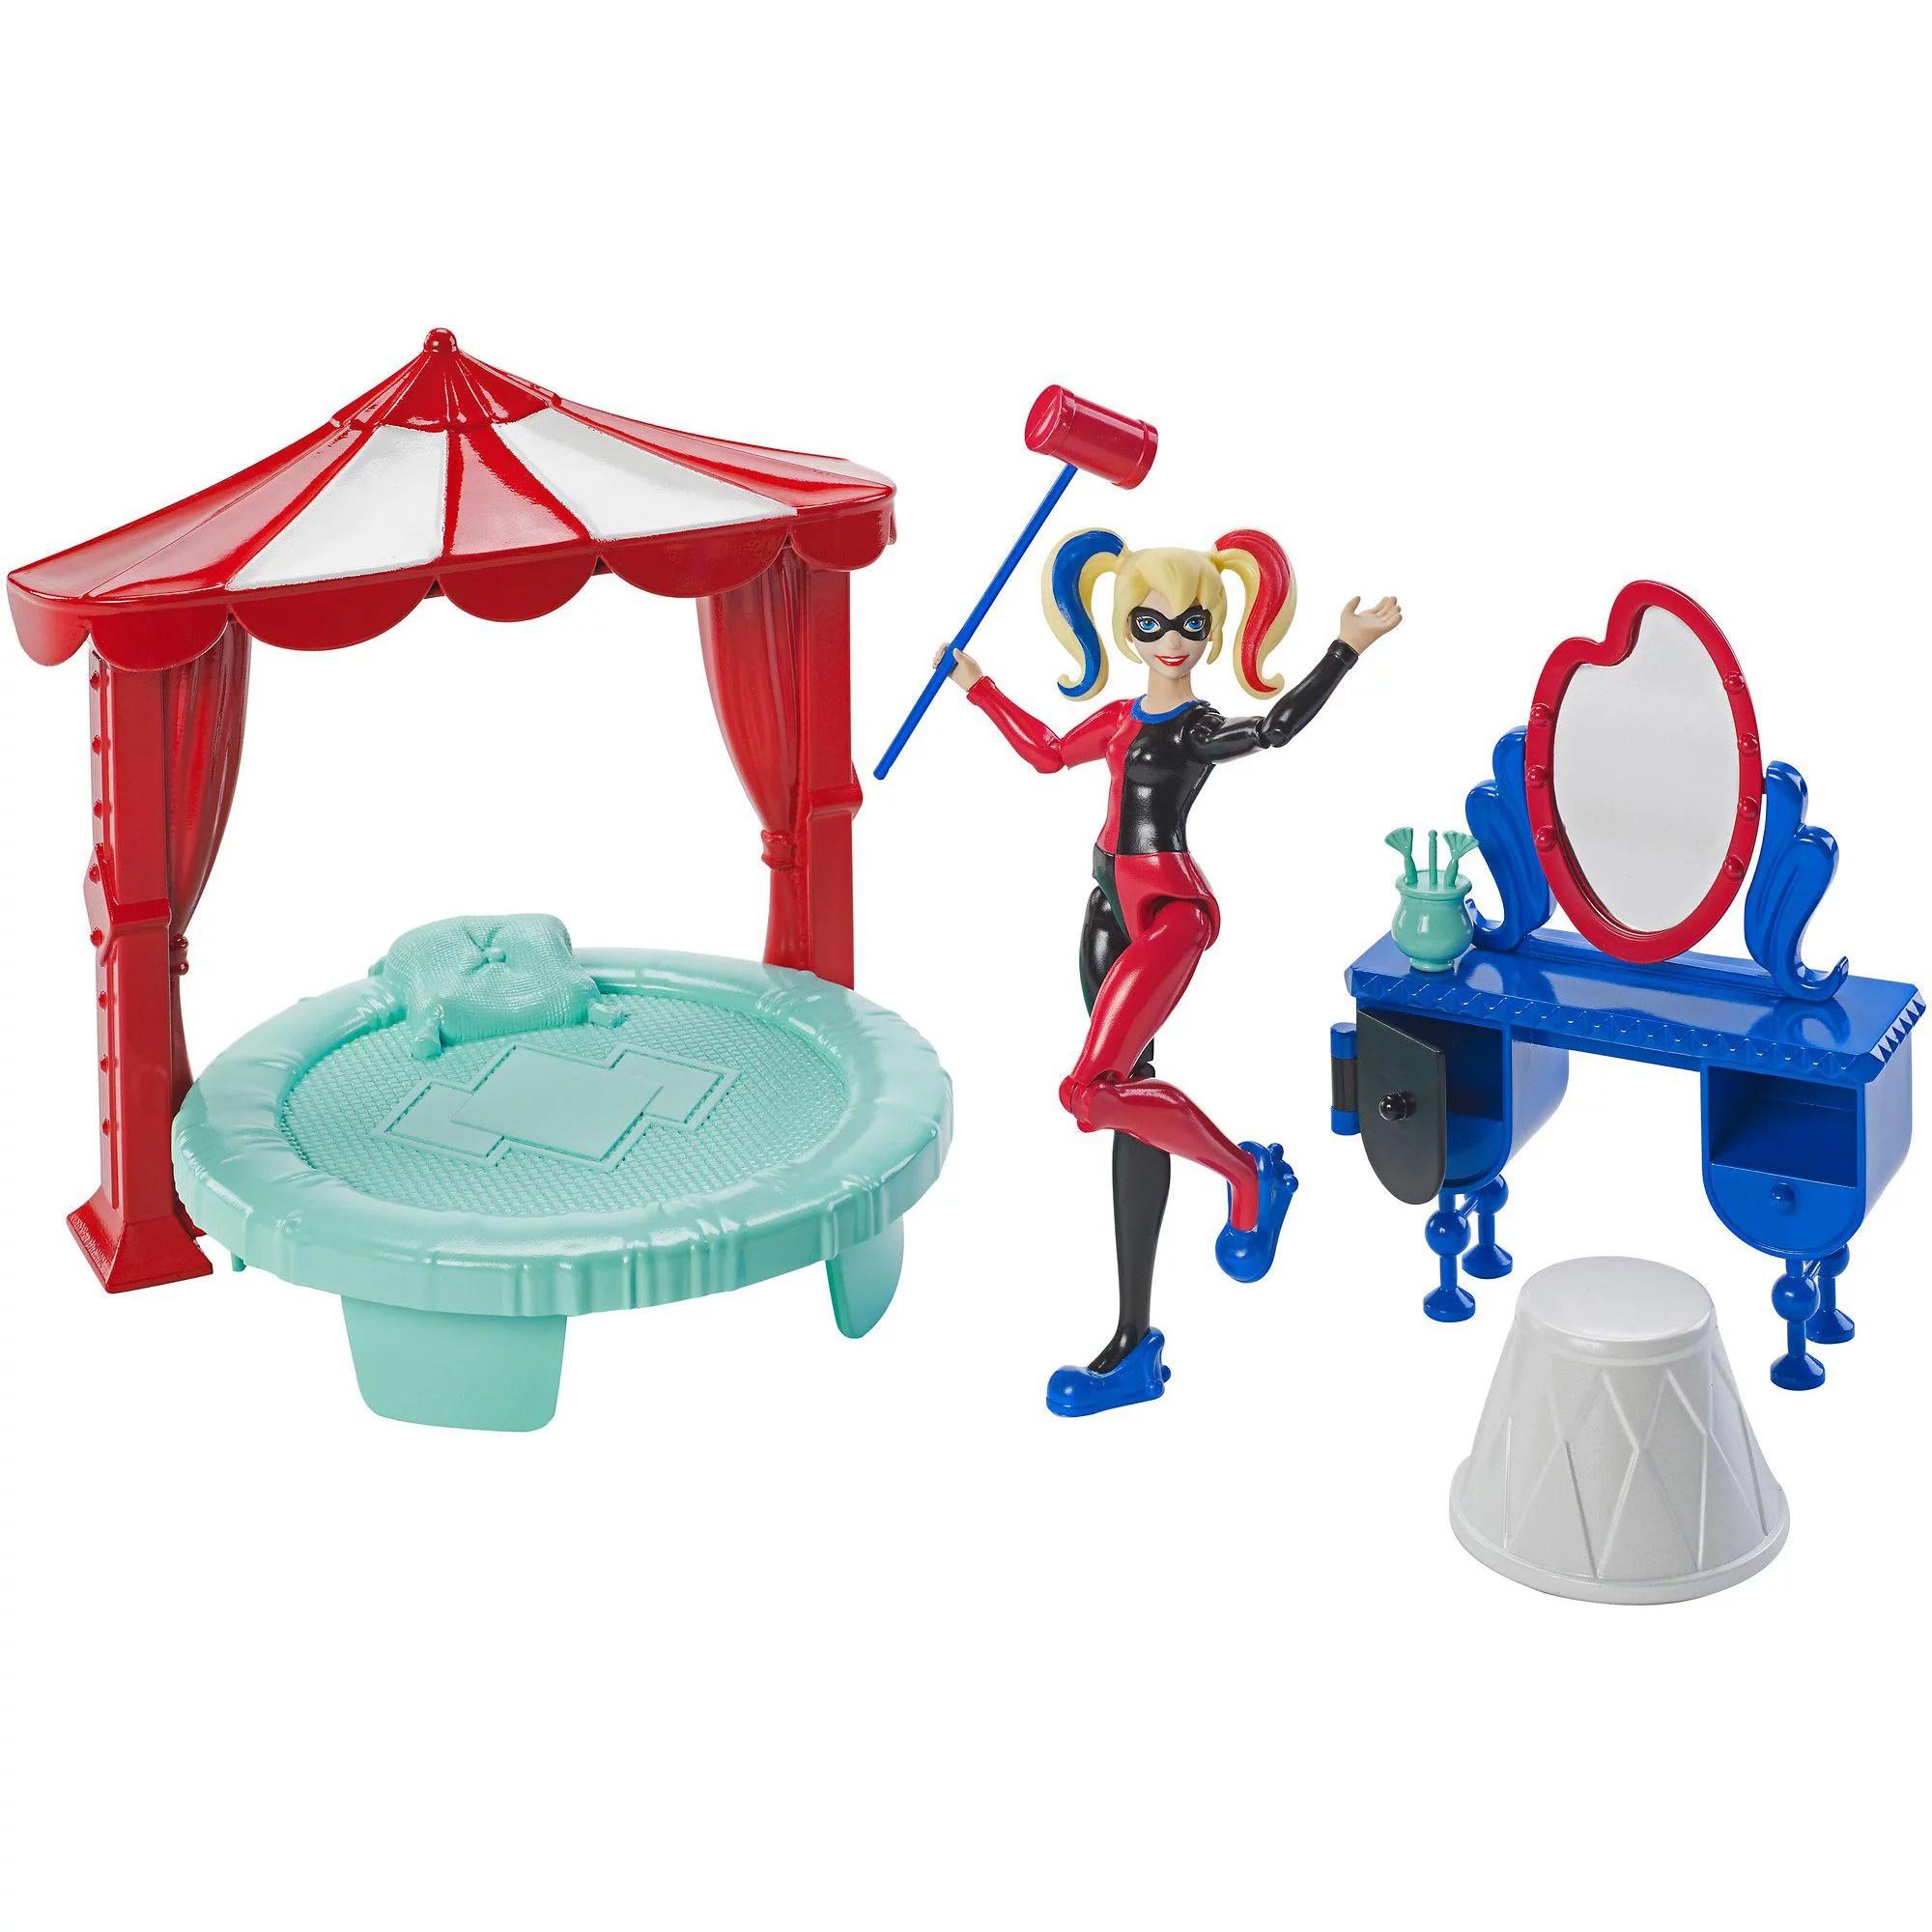 dc super hero girls harley quinn 6 inch figure and bedroom play set